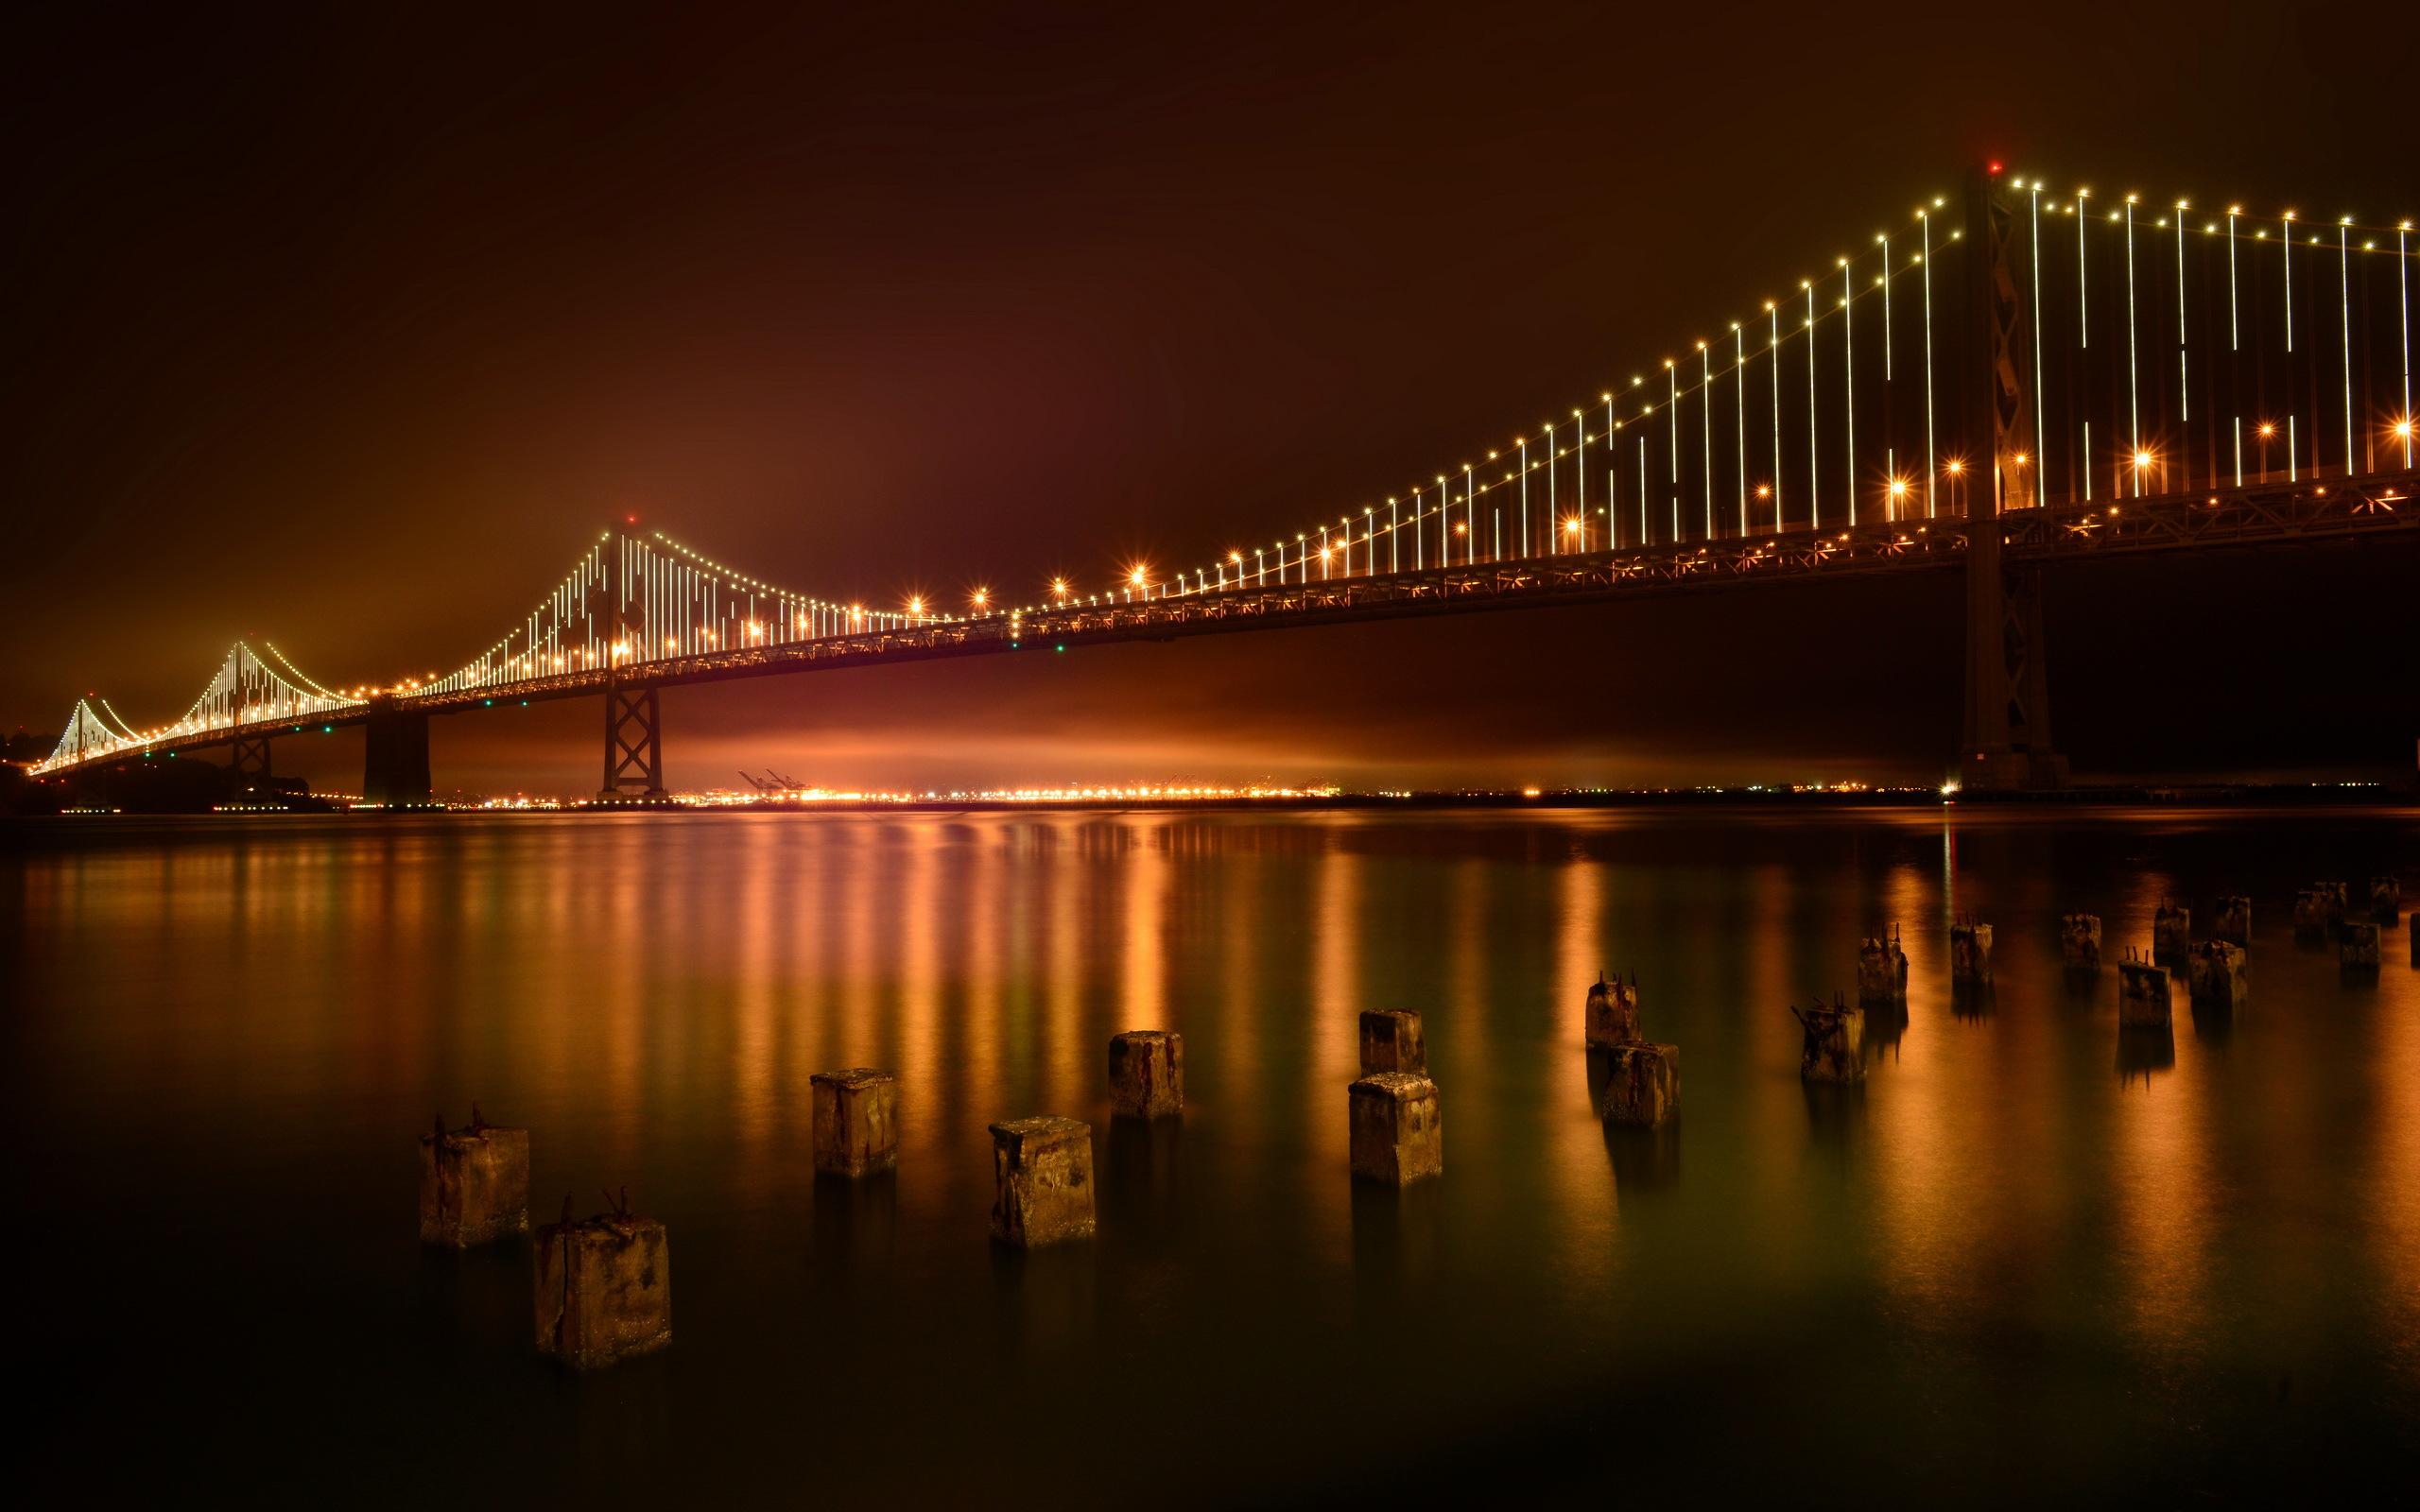 Bay bridge full hd wallpaper and background image - Bridge wallpaper hd ...